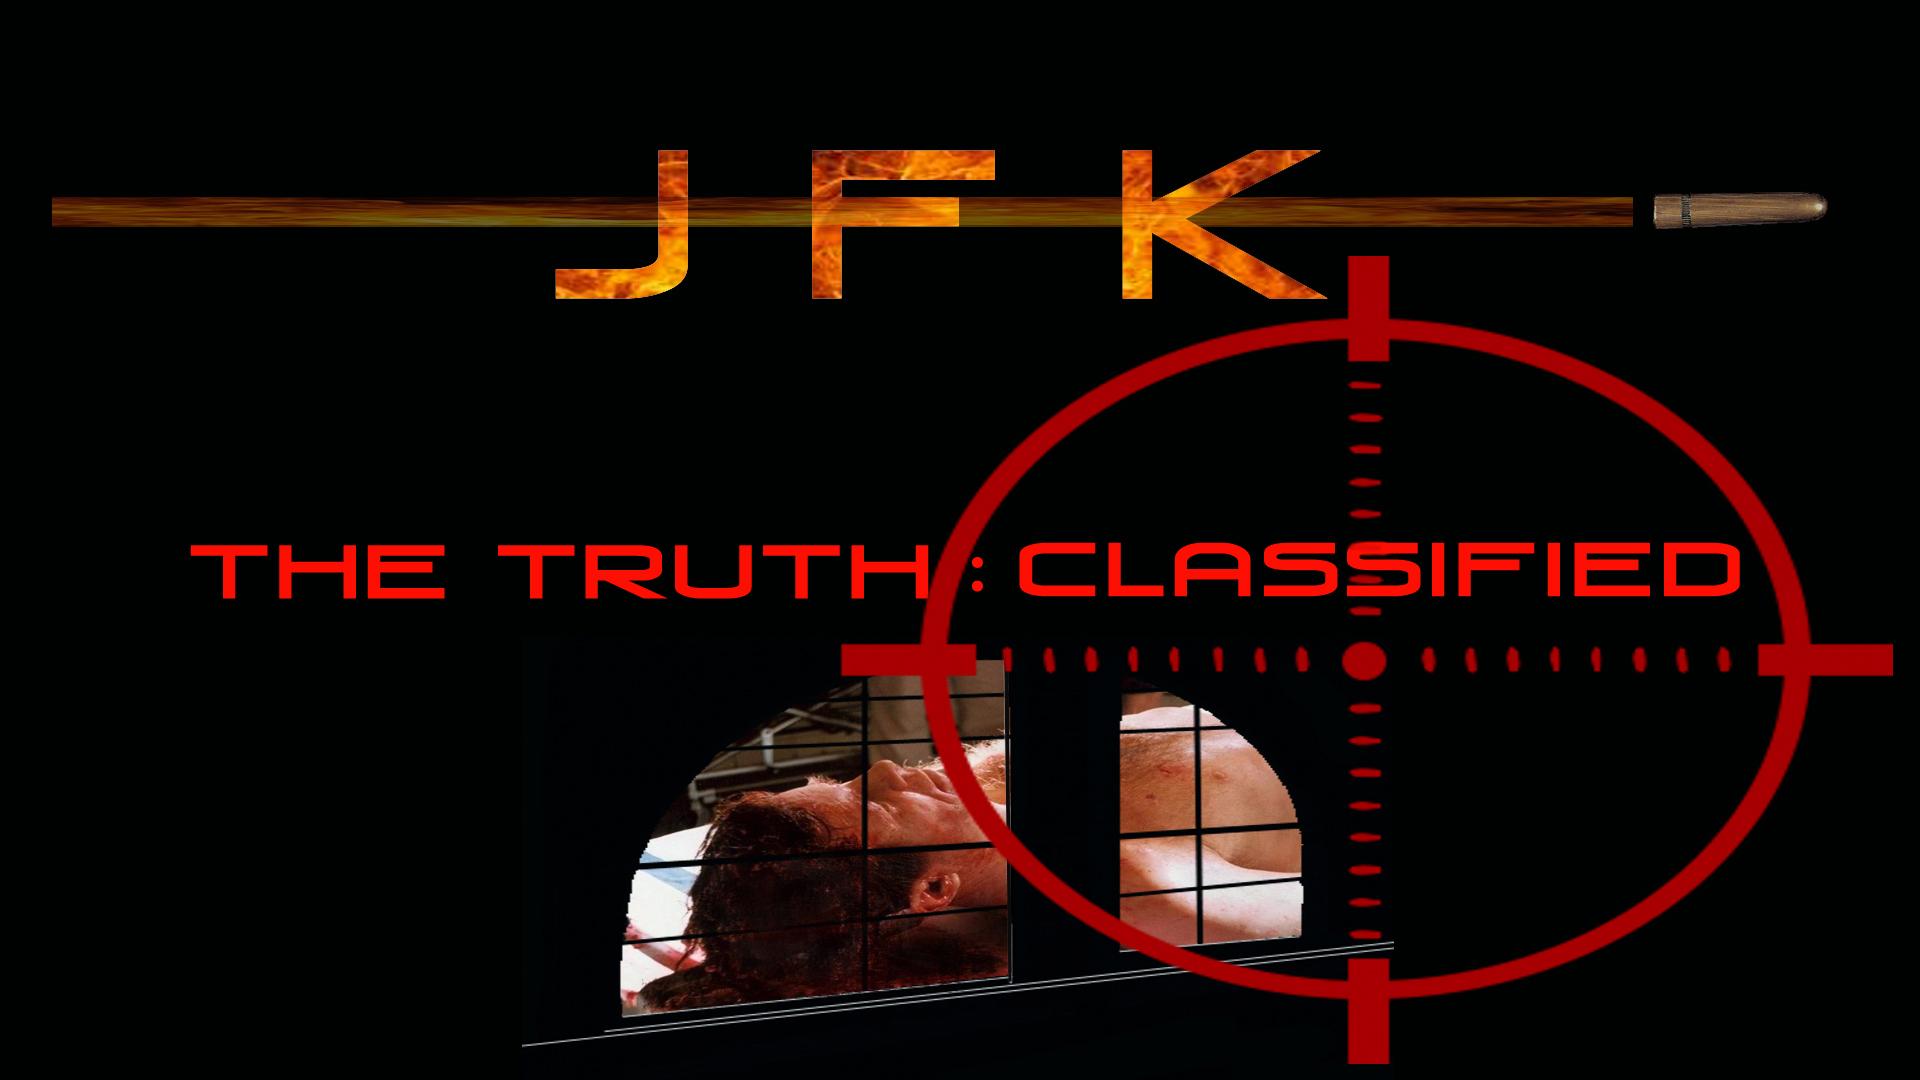 JFK 3psdB